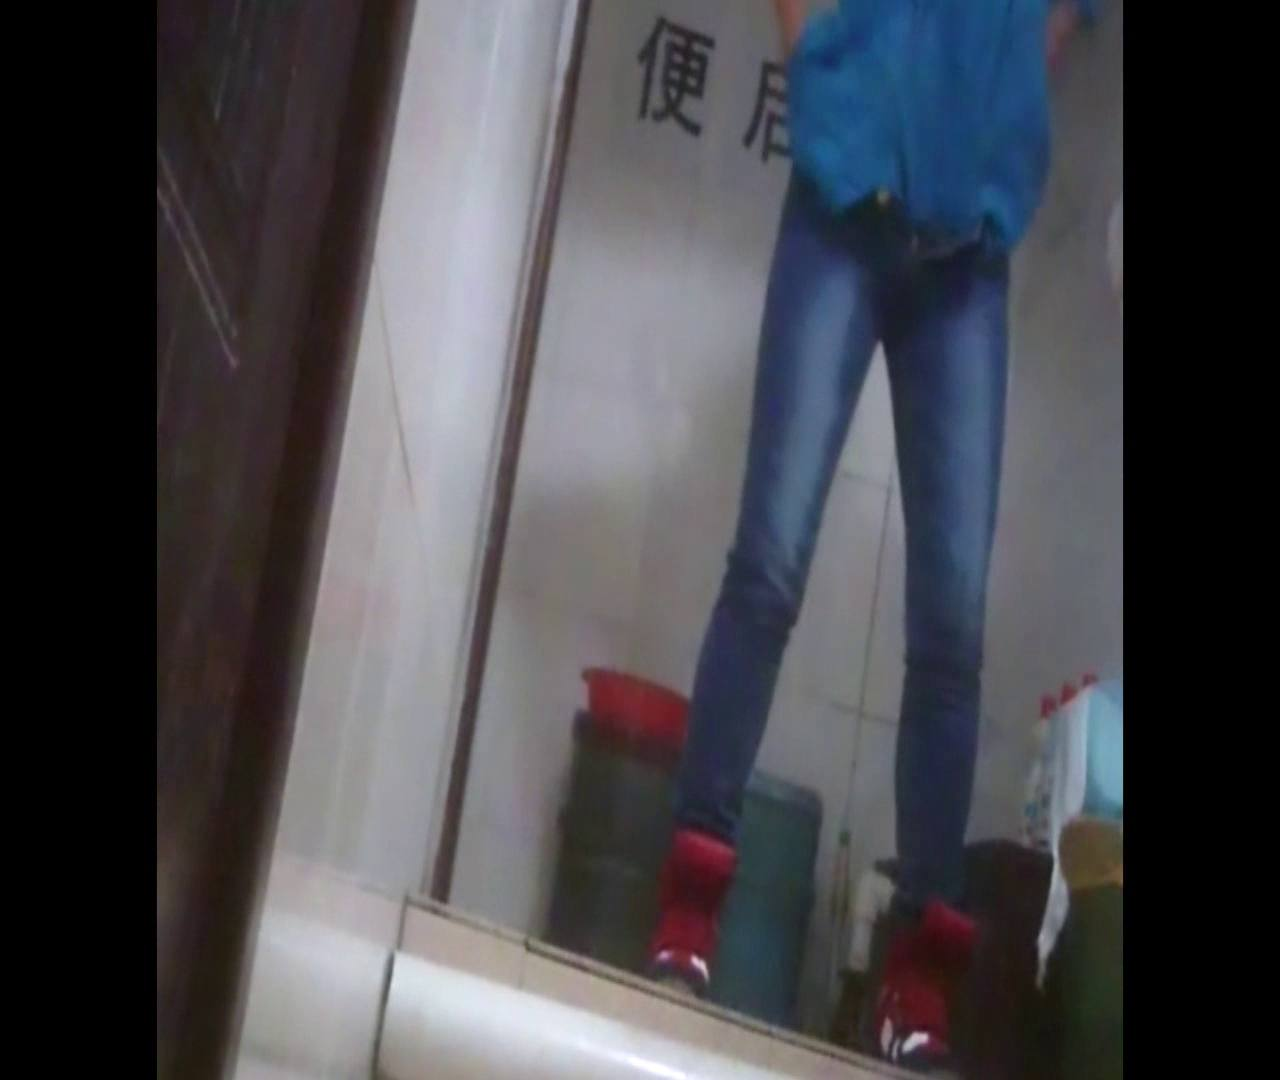 Vol.37 豊満な胸を持つマッシュルームカットな彼女 洗面所 盗撮おめこ無修正動画無料 60pic 47